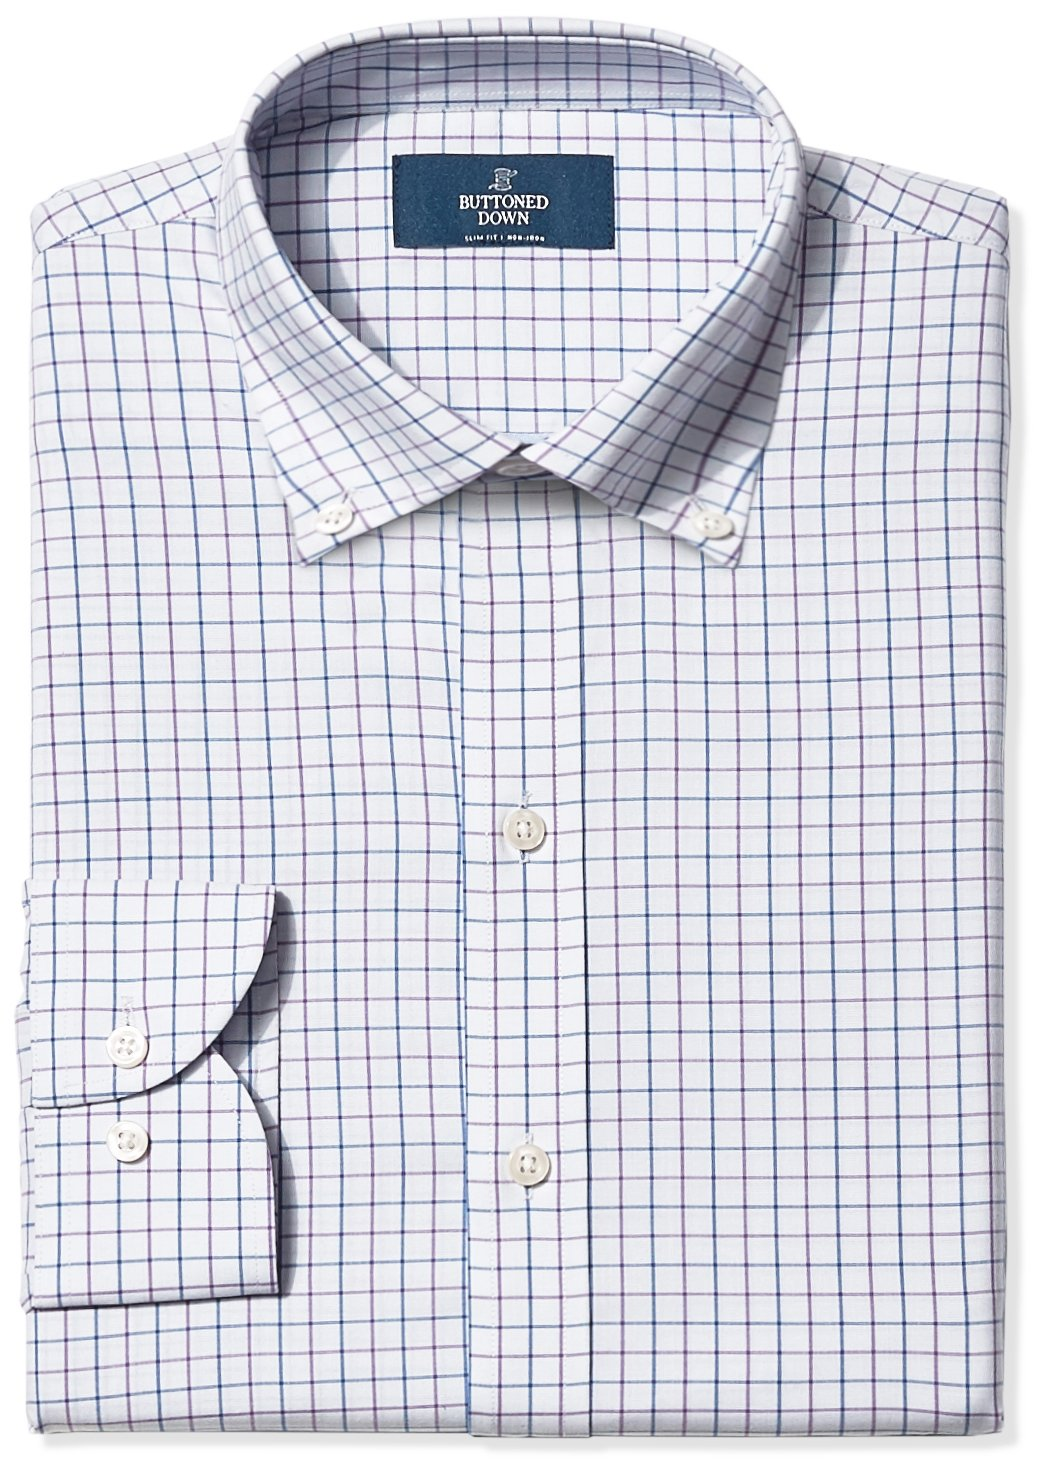 BUTTONED DOWN Men's Slim Fit Button-Collar Non-Iron Dress Shirt, Grey/Purple/Blue Tattersall Check, 16'' Neck 36'' Sleeve